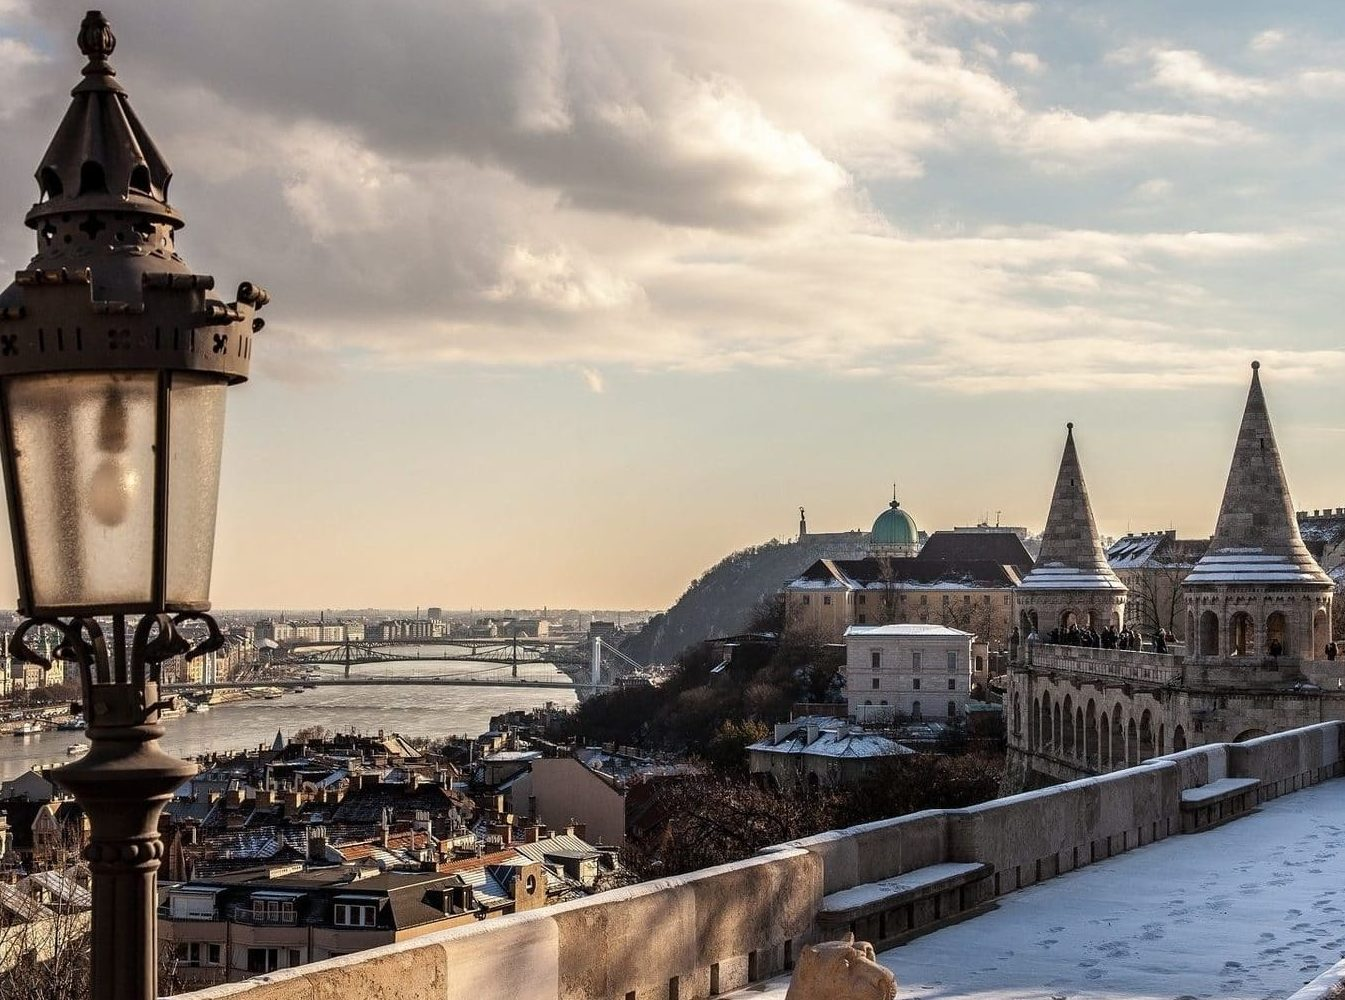 visiter Budapest bastion des pecheurs